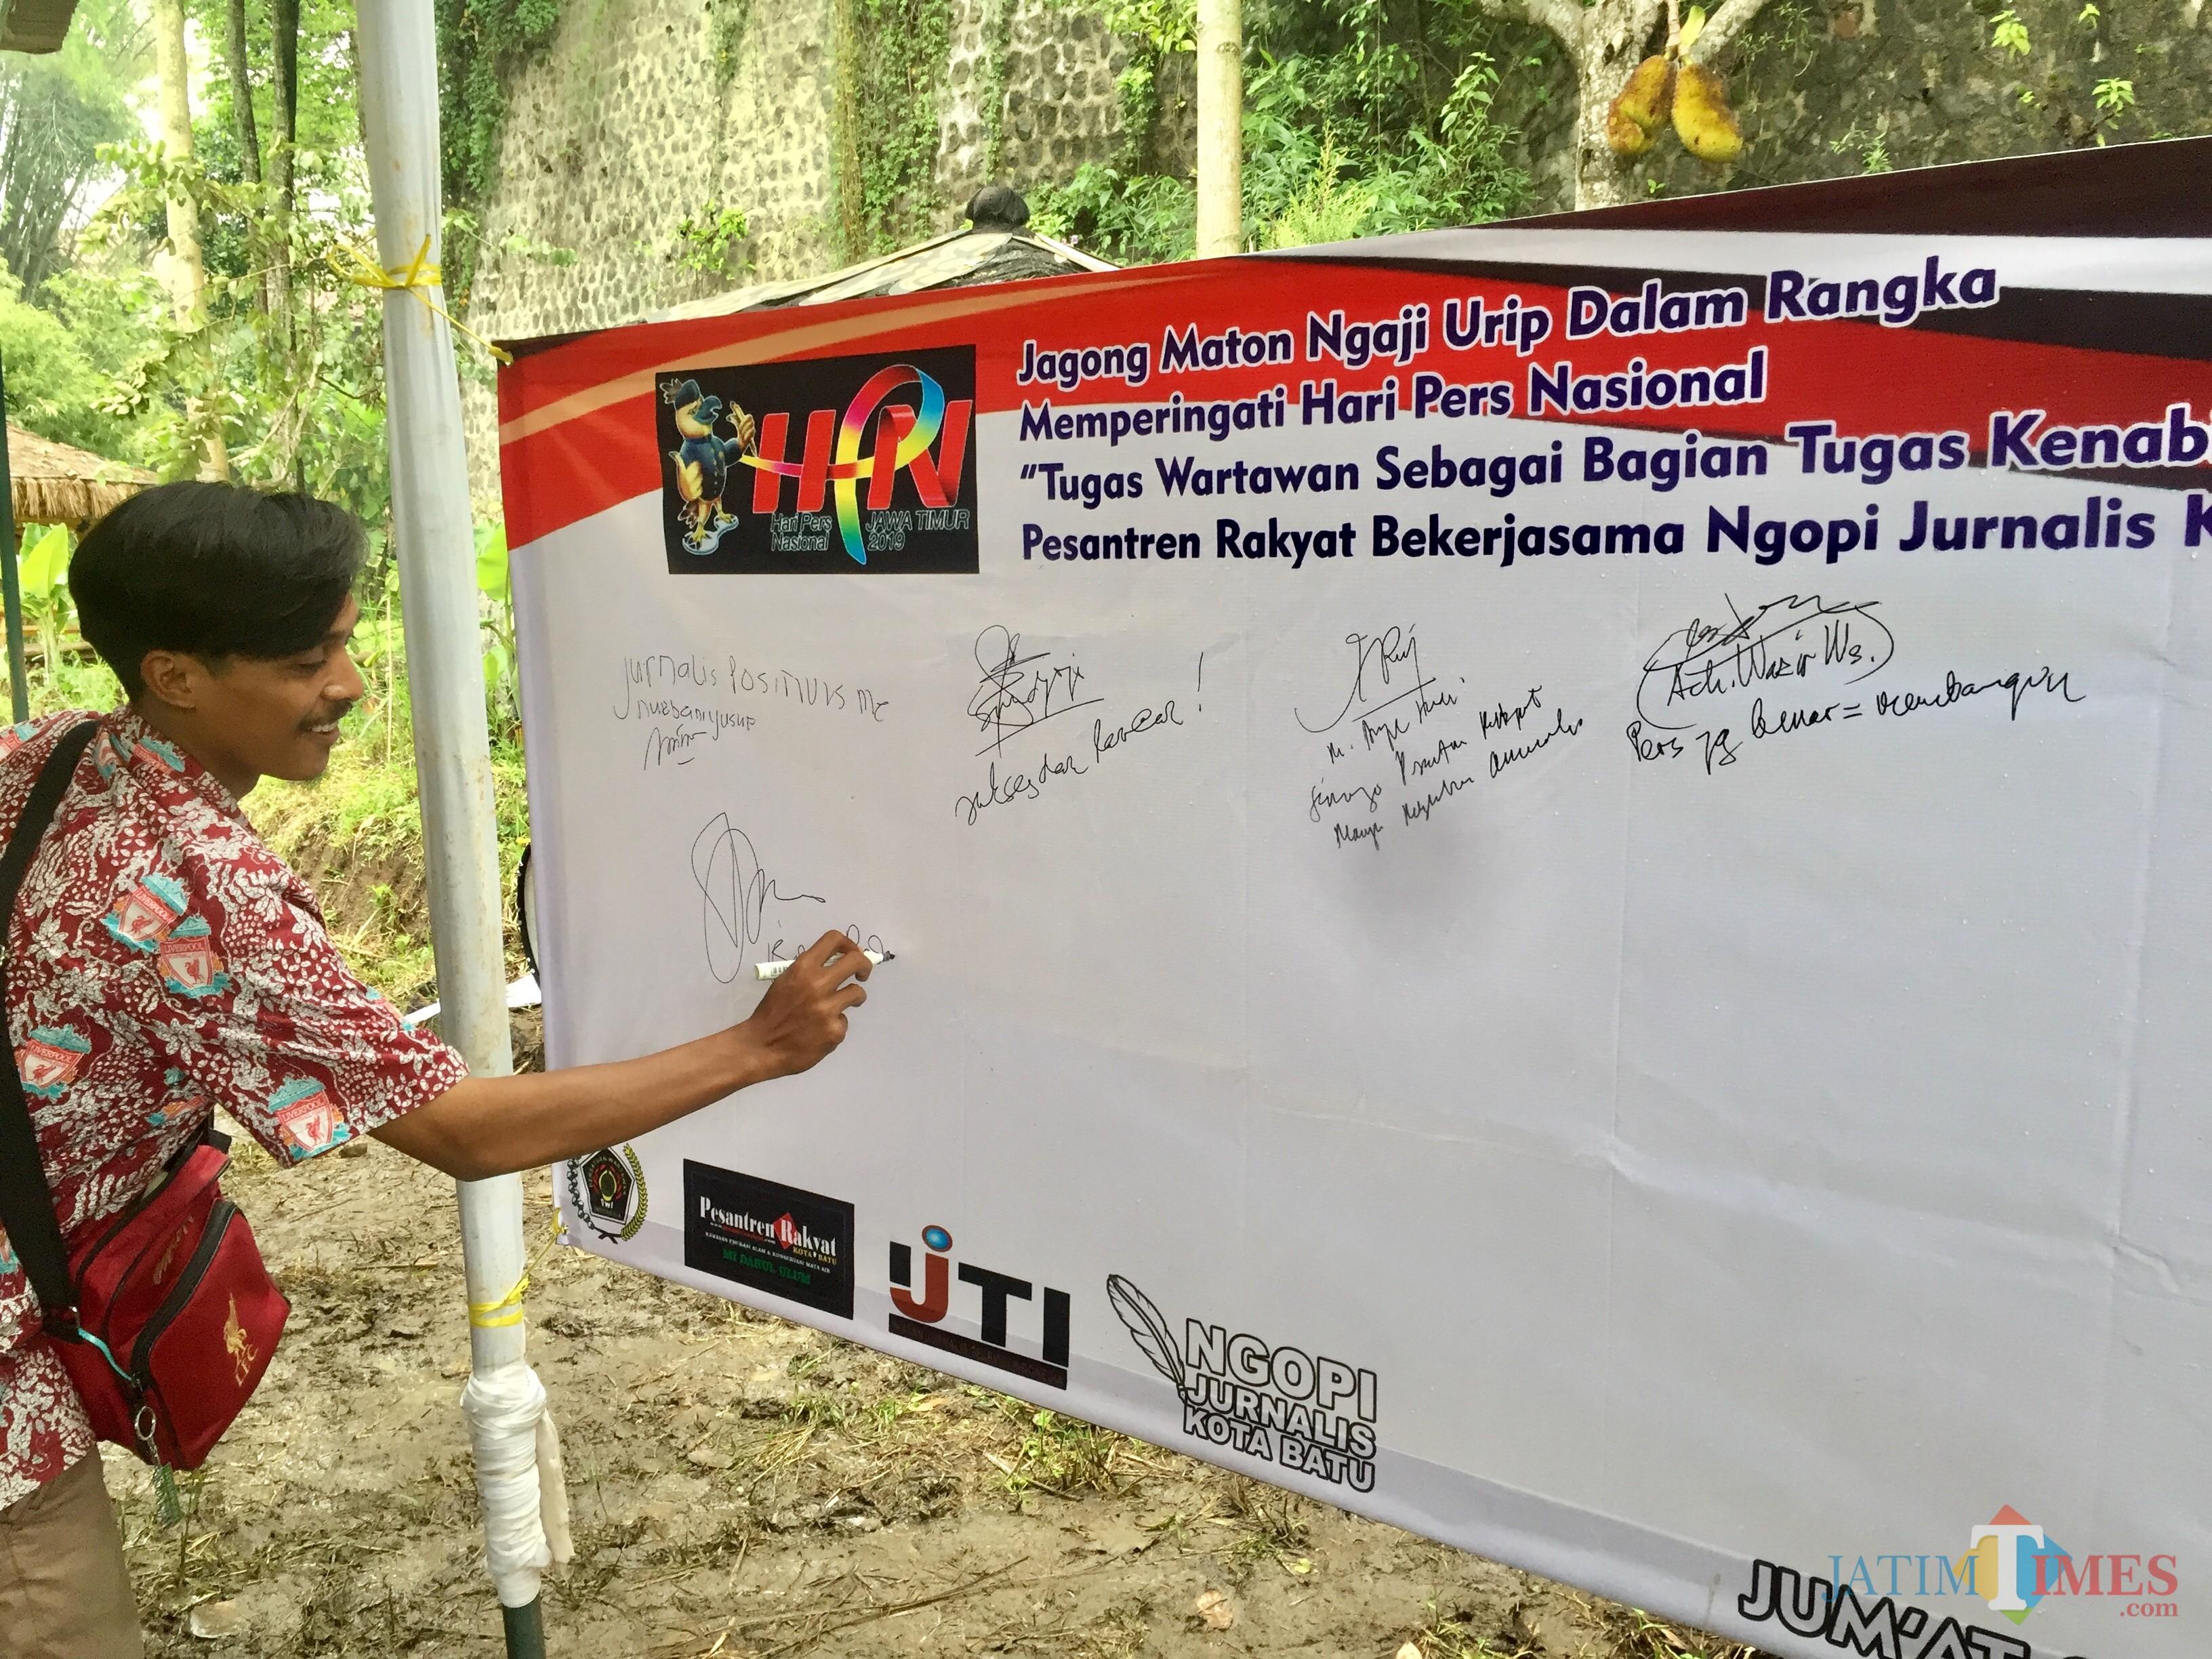 Salah satu wartawan menandatangani komitmen di HPN 2019 diPesantren Rakyat Kota Batu Kawasan Edukasi Alam & Konservasi Sumber Mata Air MI Darul Ulum, Dusun Macari, Desa Pesanggrahan, Kecamatan Batu, Jumat (8/2/2019). (Foto: Irsya Richa/MalangTIMES)